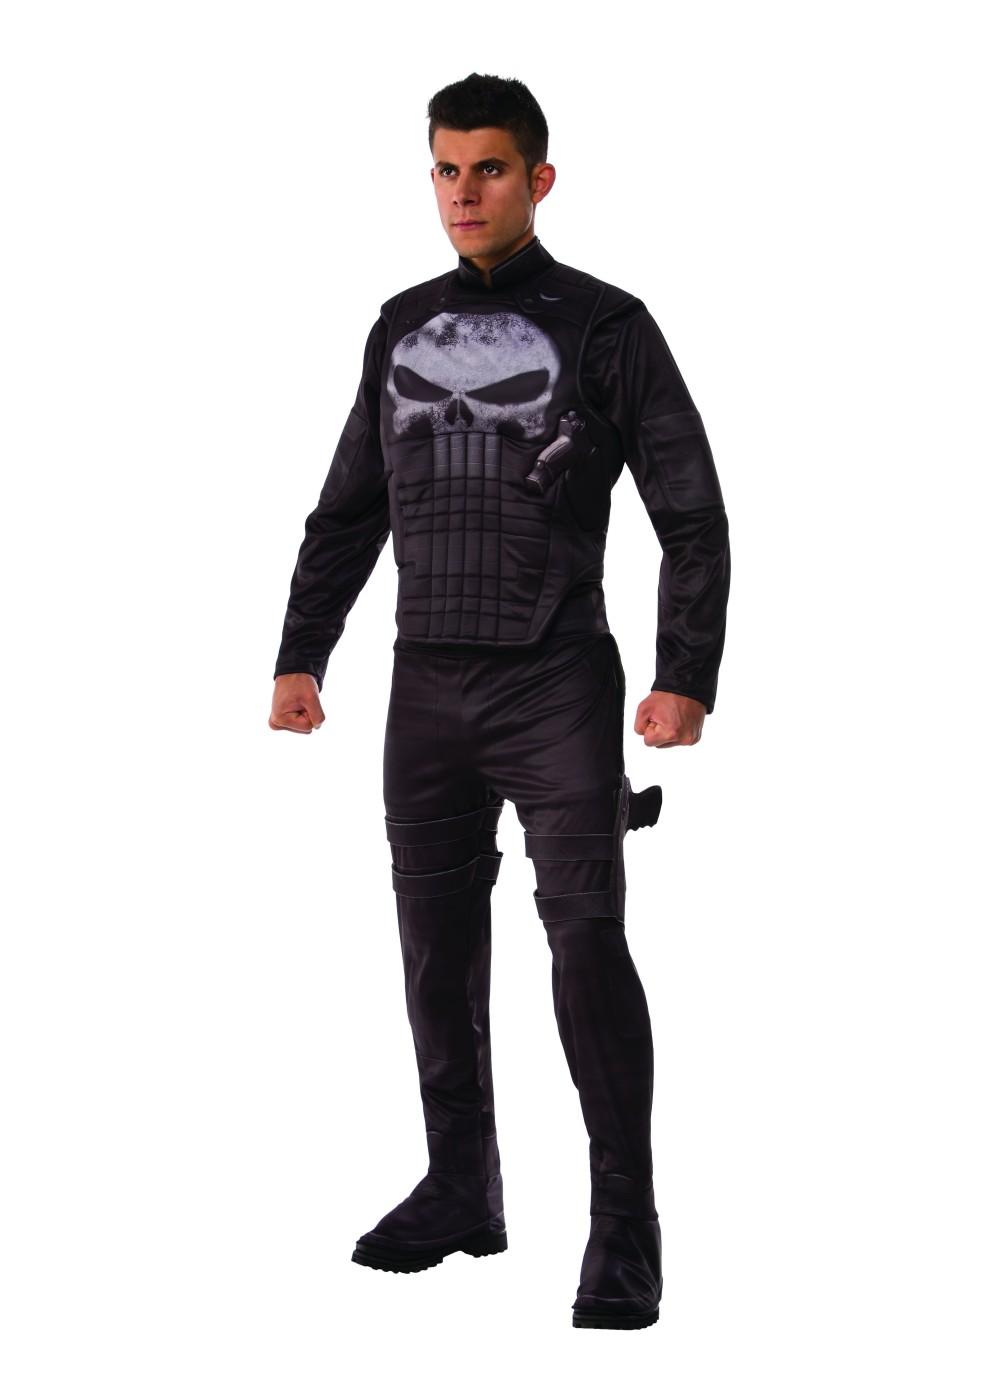 marvel-punisher-man-costume